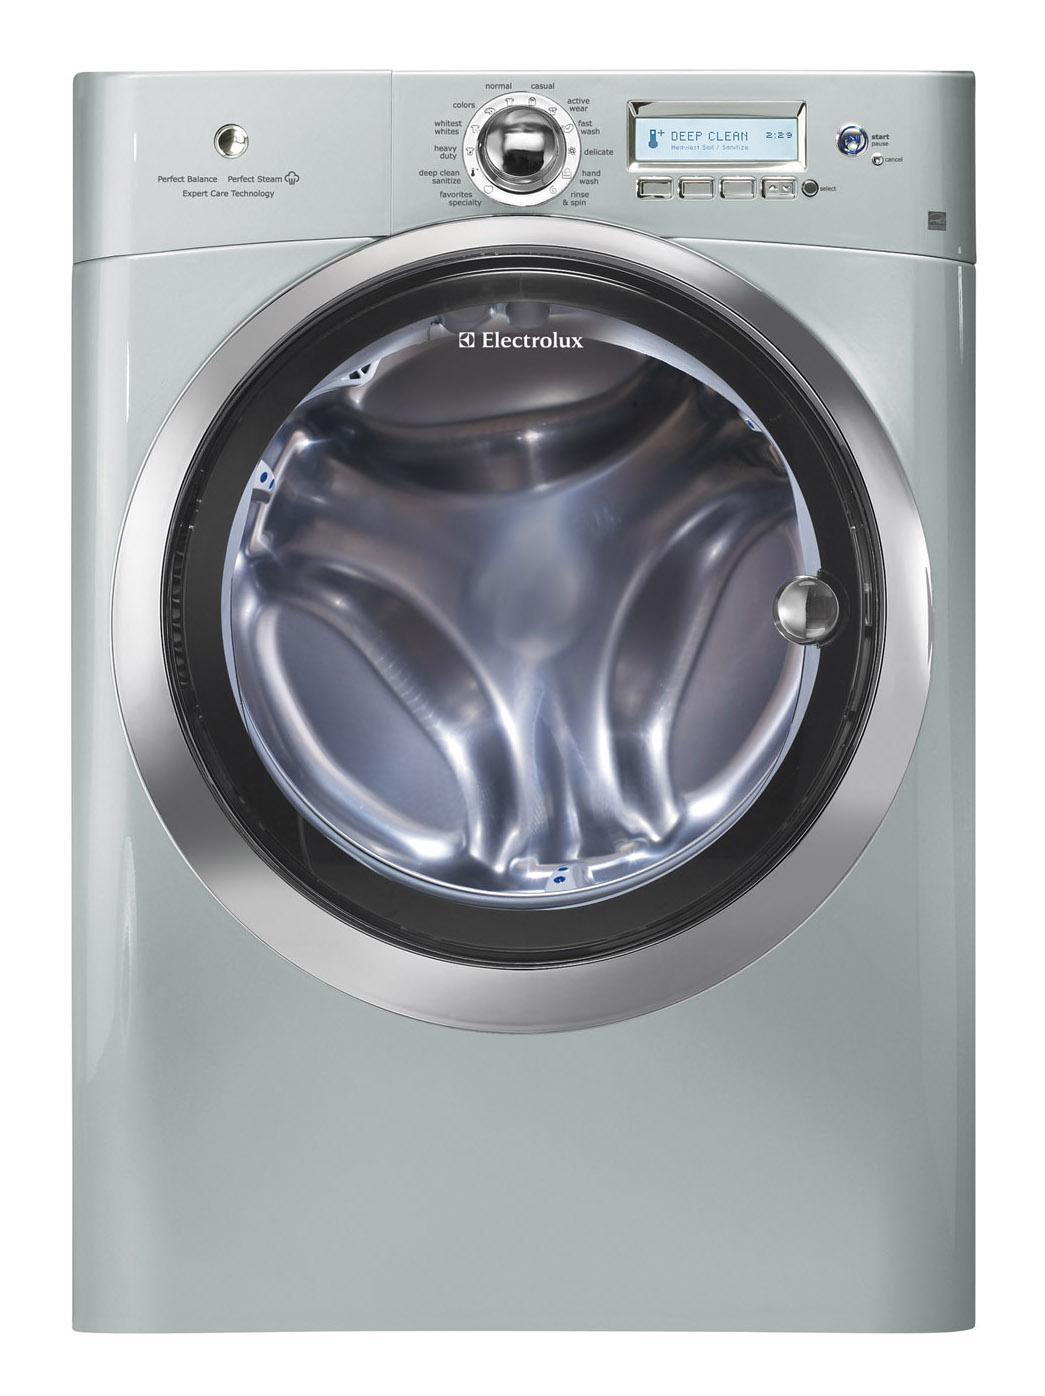 Electrolux Washers 4.42 Cu. Ft. Front Load Washer - Item Number: EWFLS70JSS